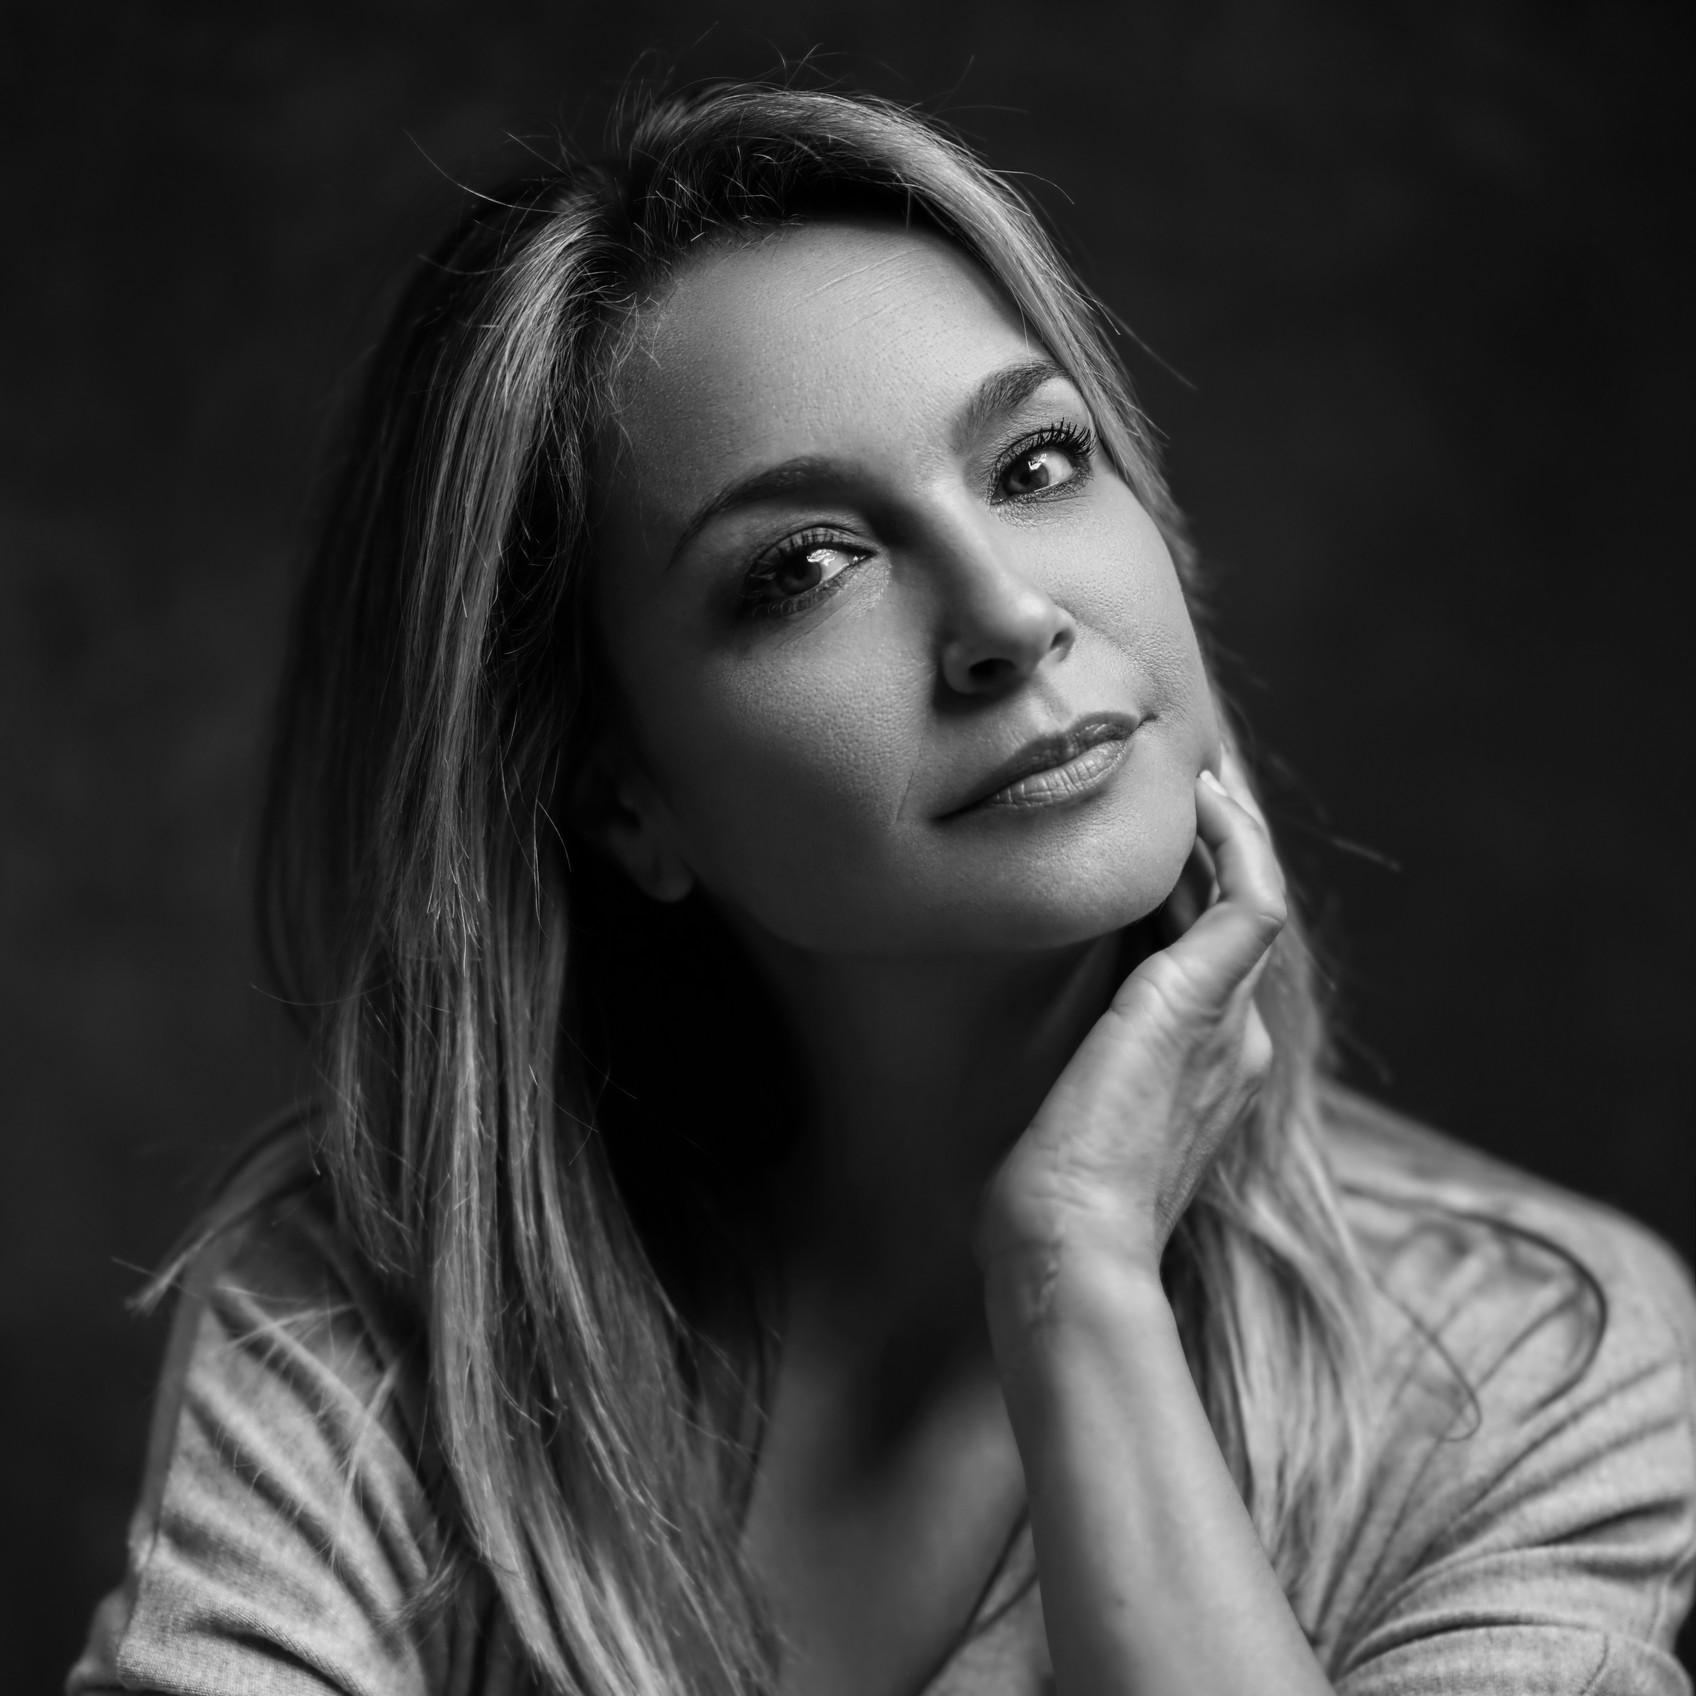 Raquel Infante